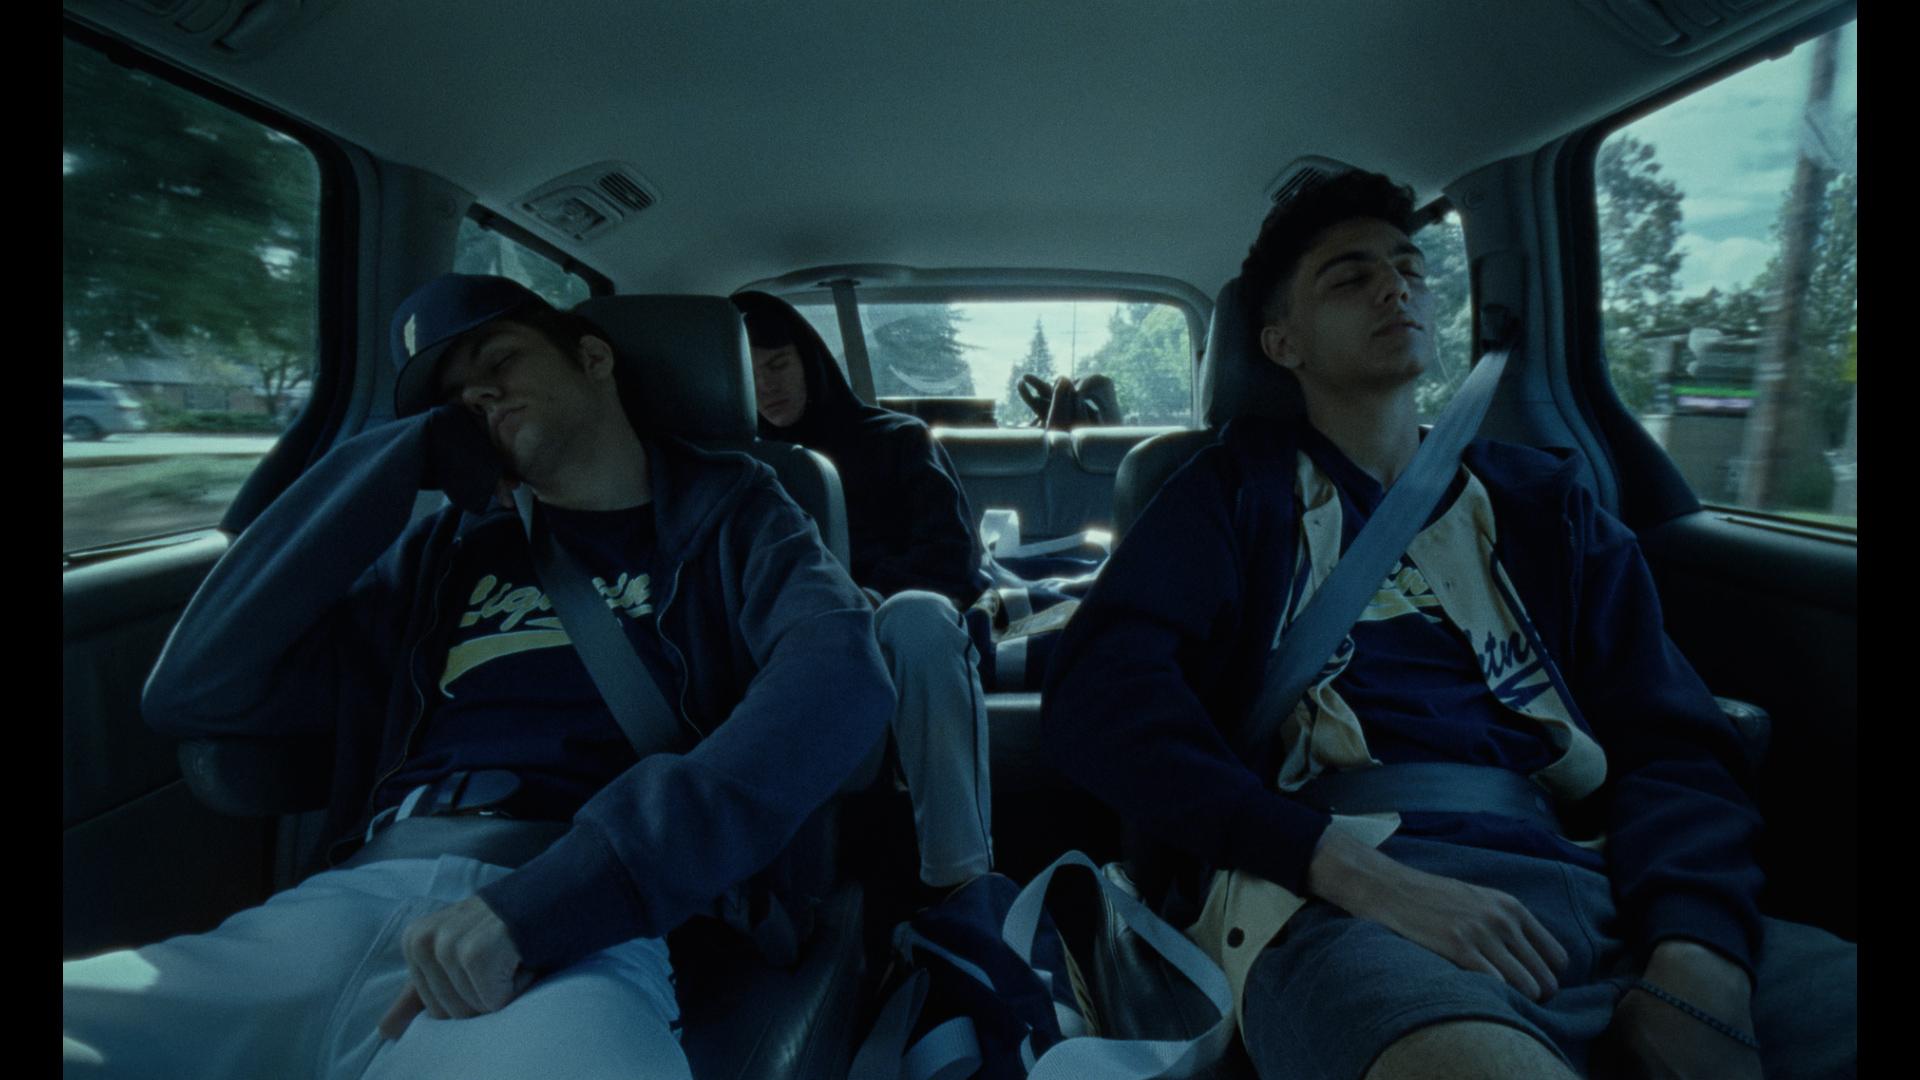 AsleepInTheCar.jpg